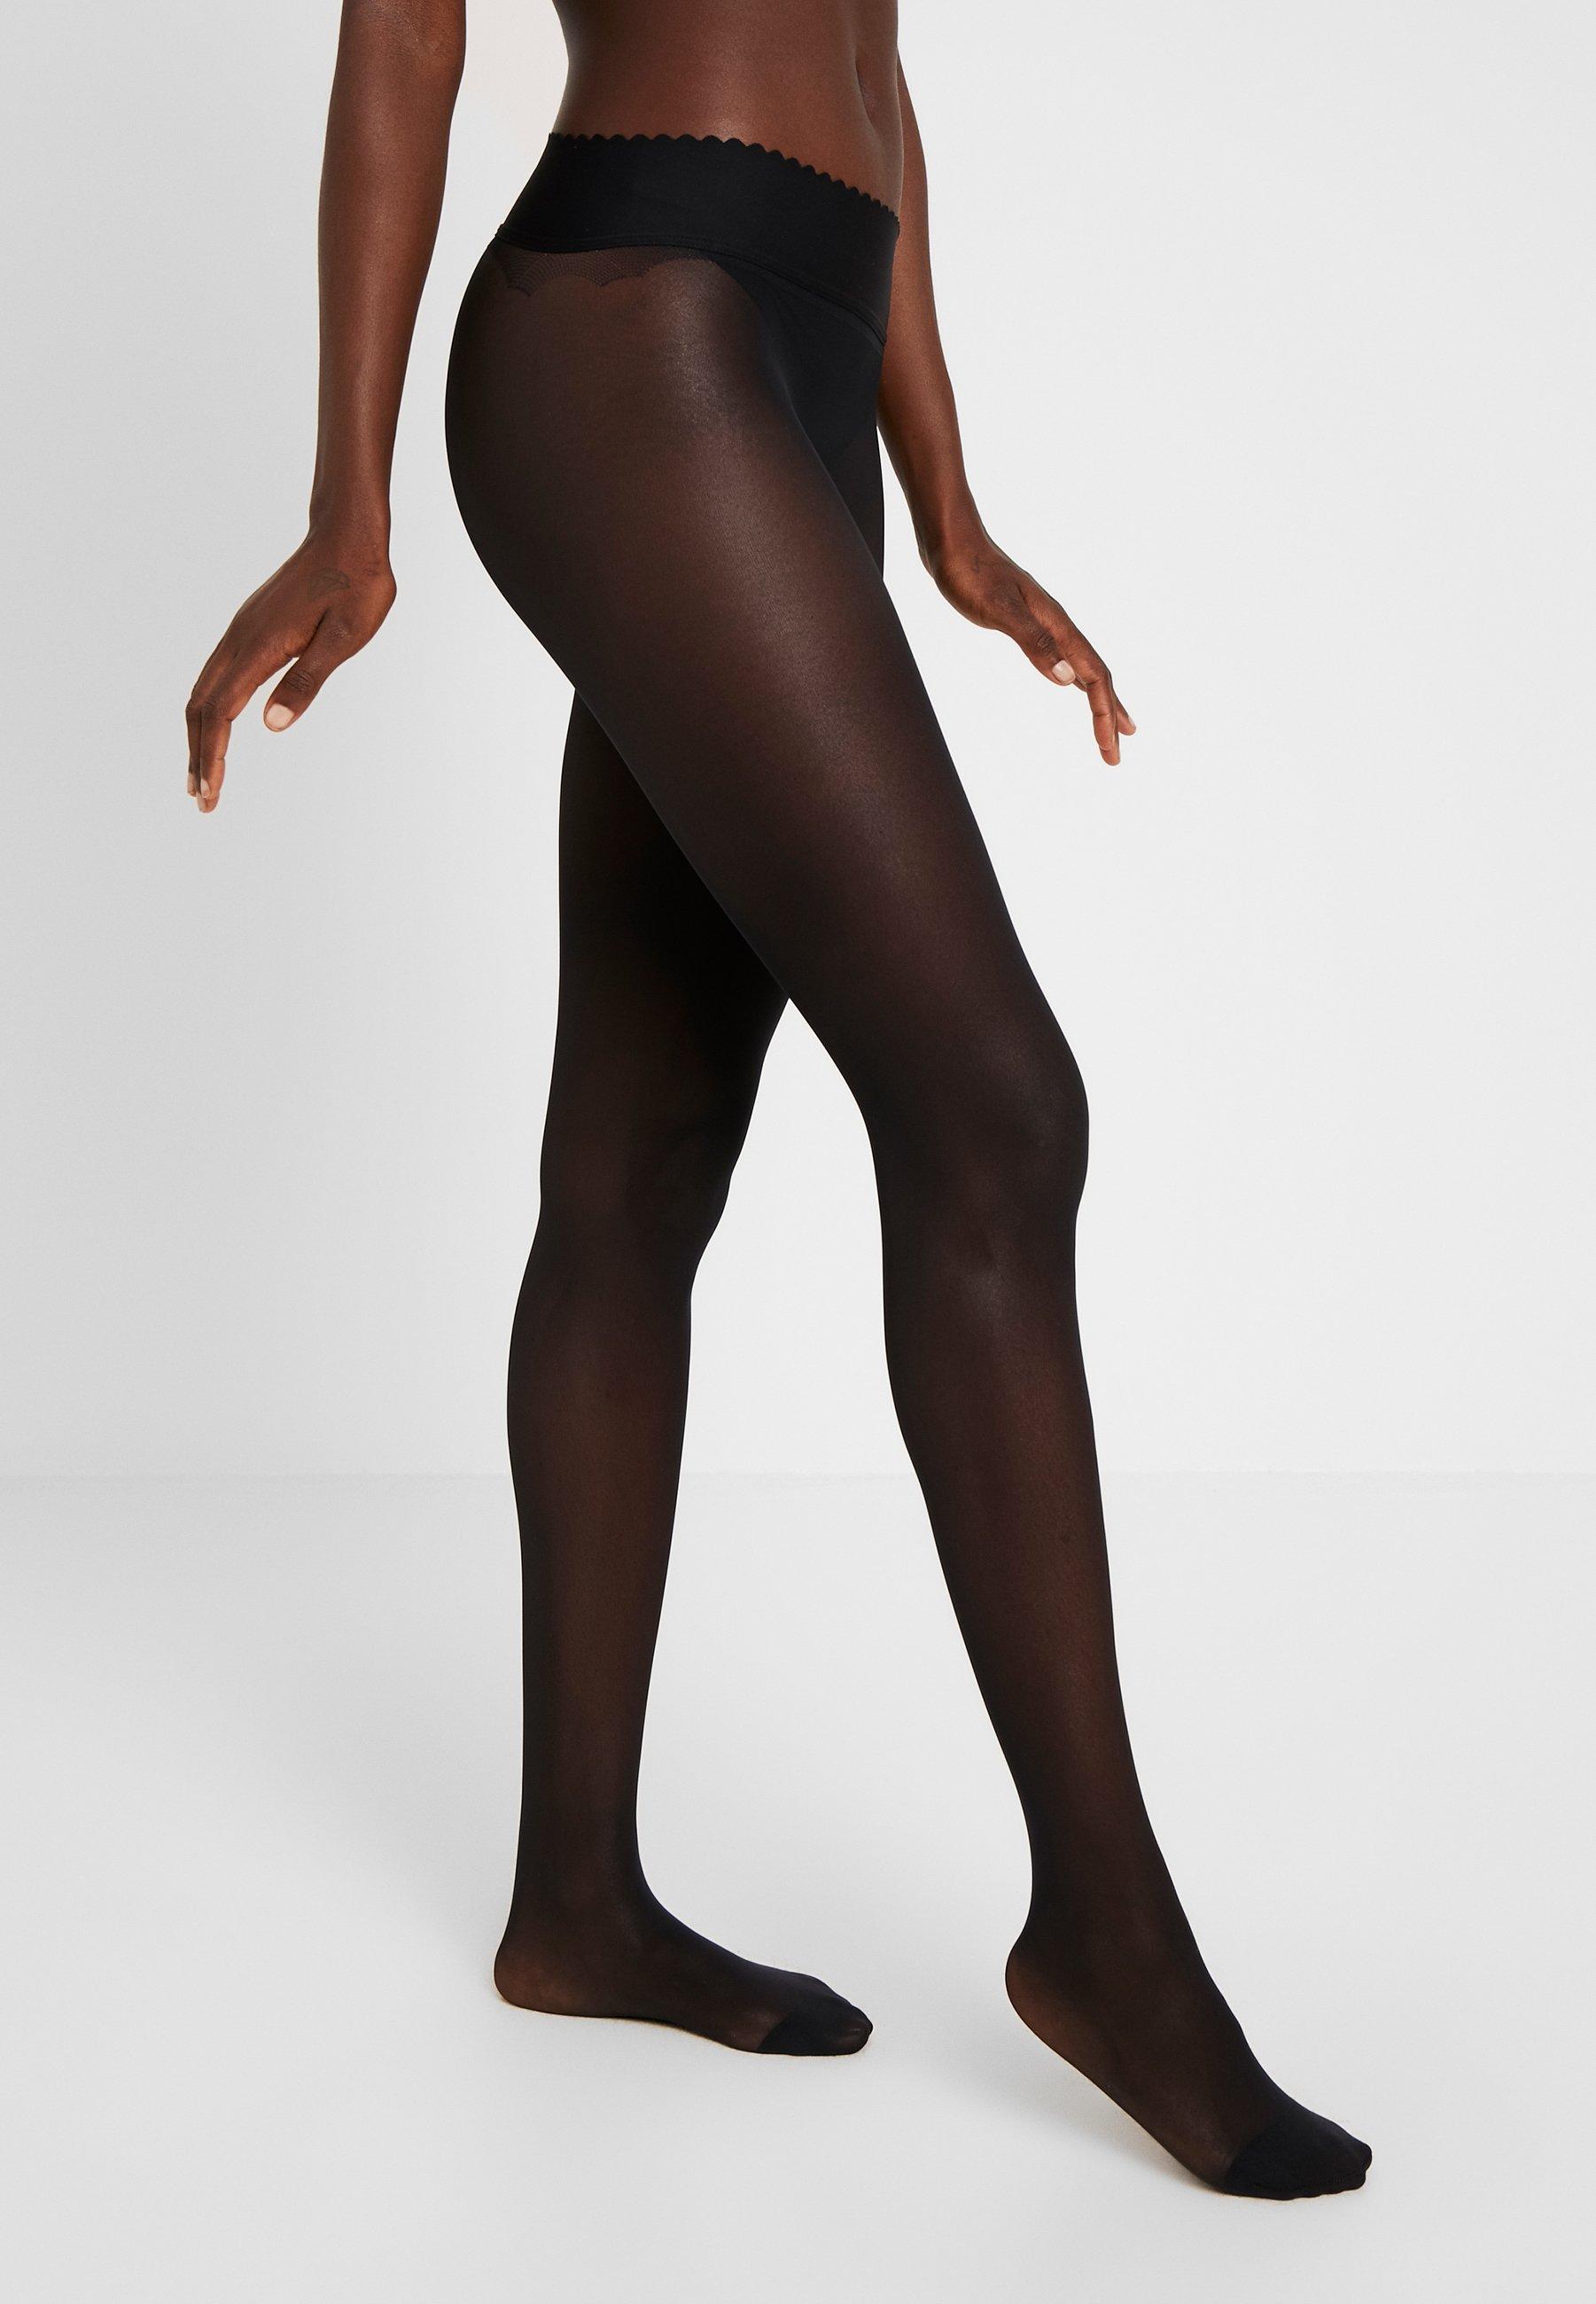 Femme SEMI OPAQUE NUDE SENSATION BODY TOUCH - Collants